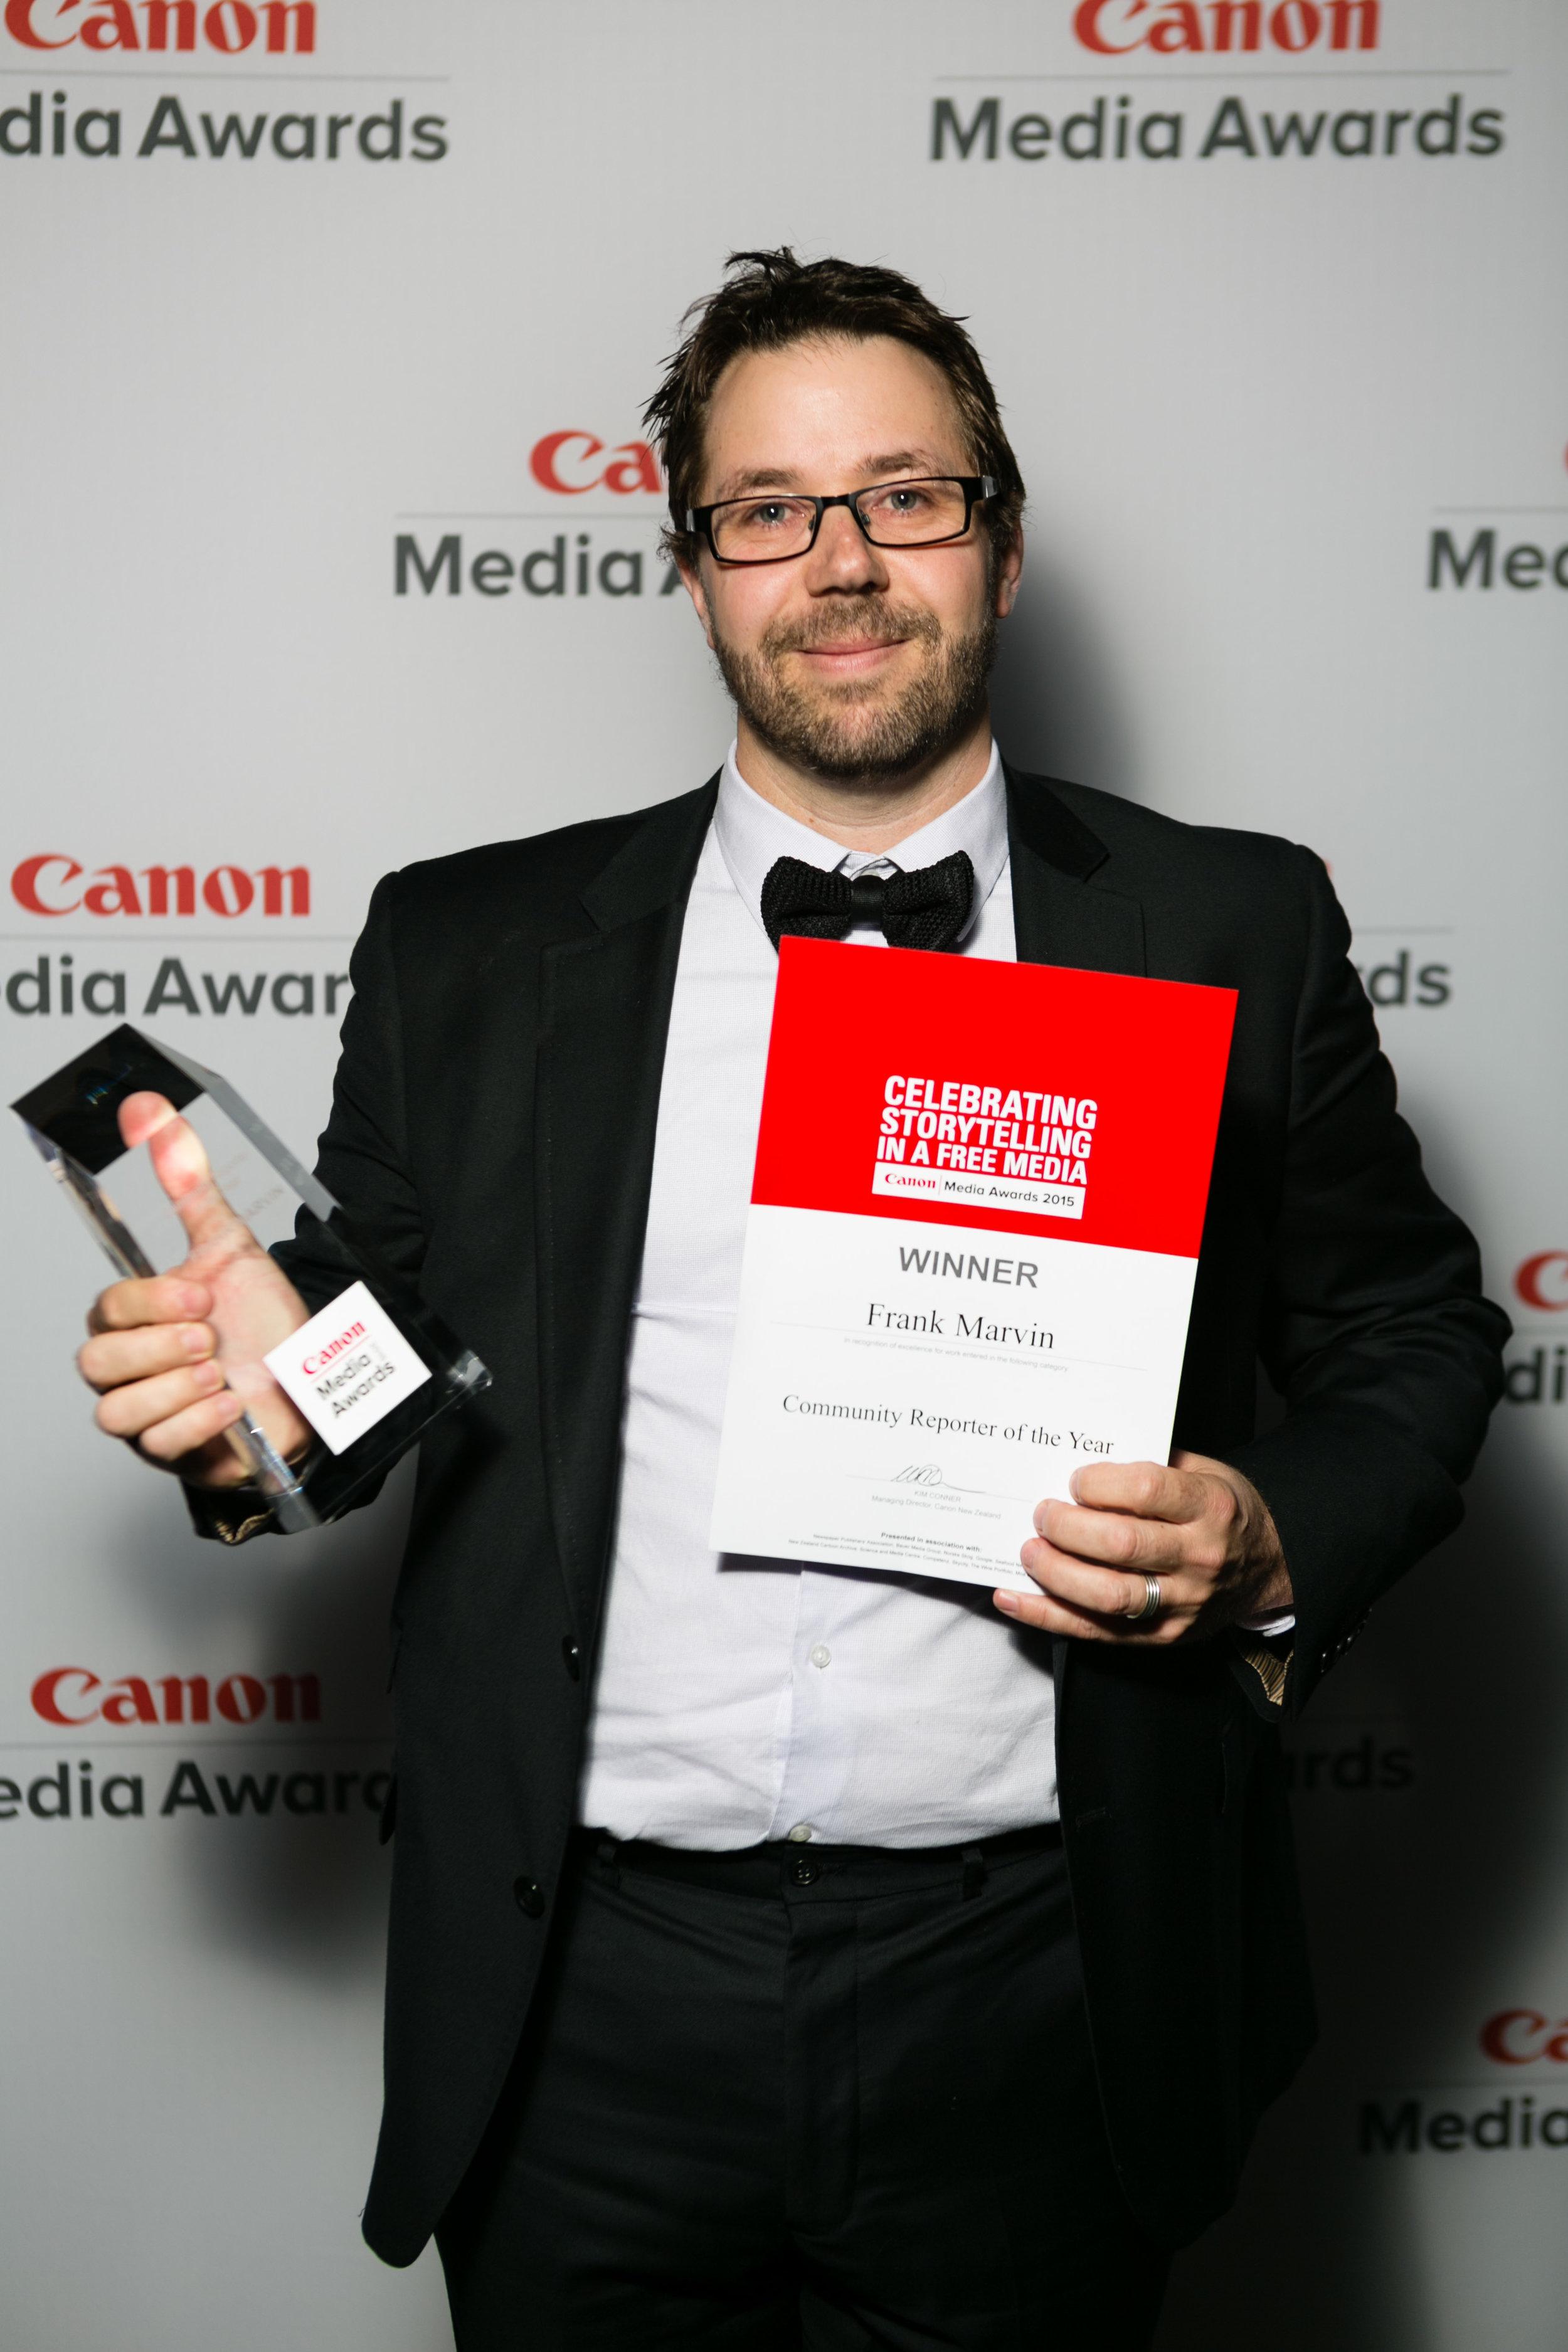 canon_media_awards_2015_interlike_nz_clinton_tudor-5928-188.jpg